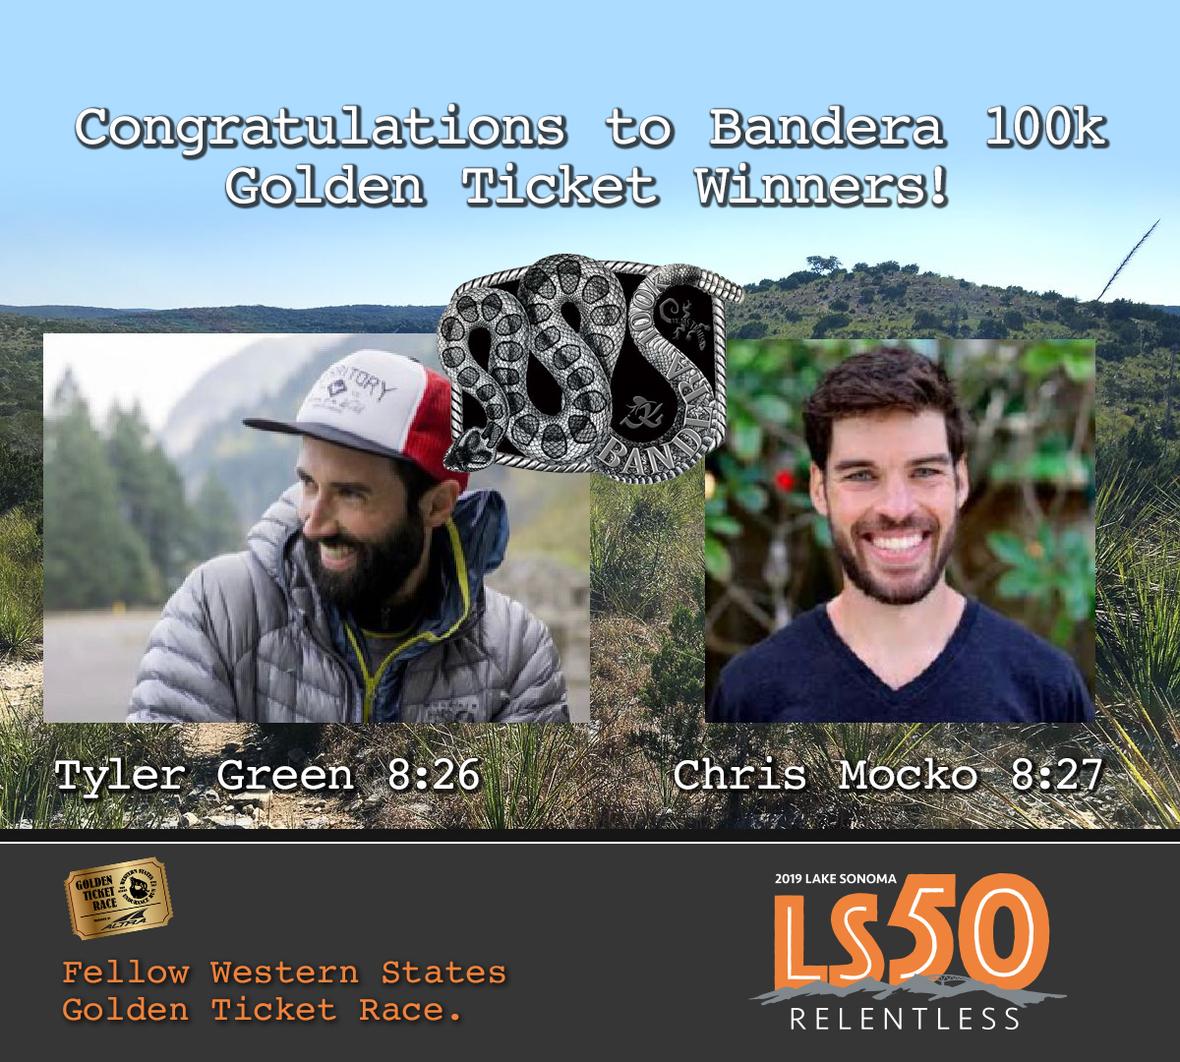 LS50 bandera winners men